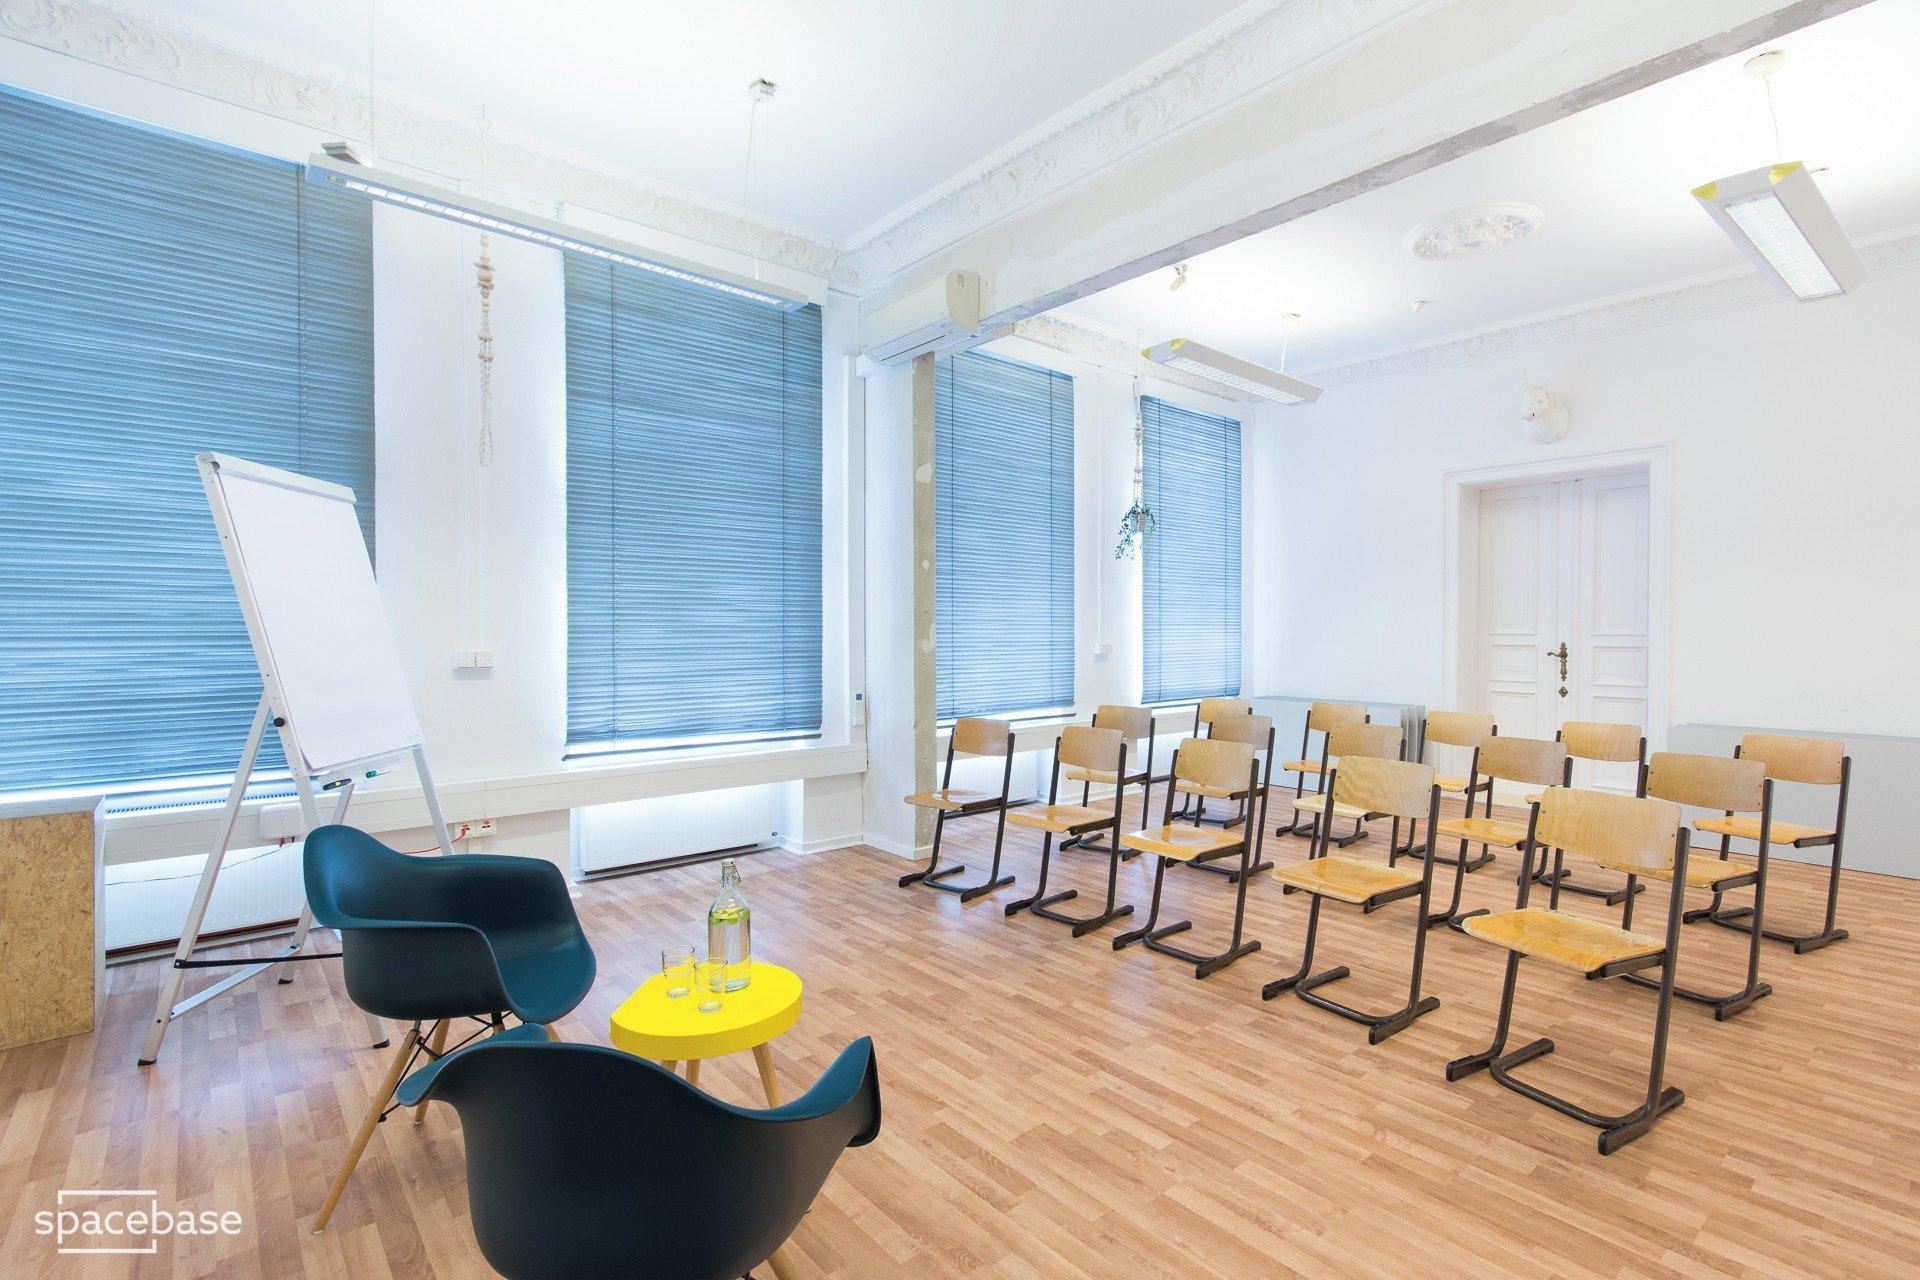 Berlin training rooms Espace de Coworking juggleHUB Coworking - Conference Room image 8